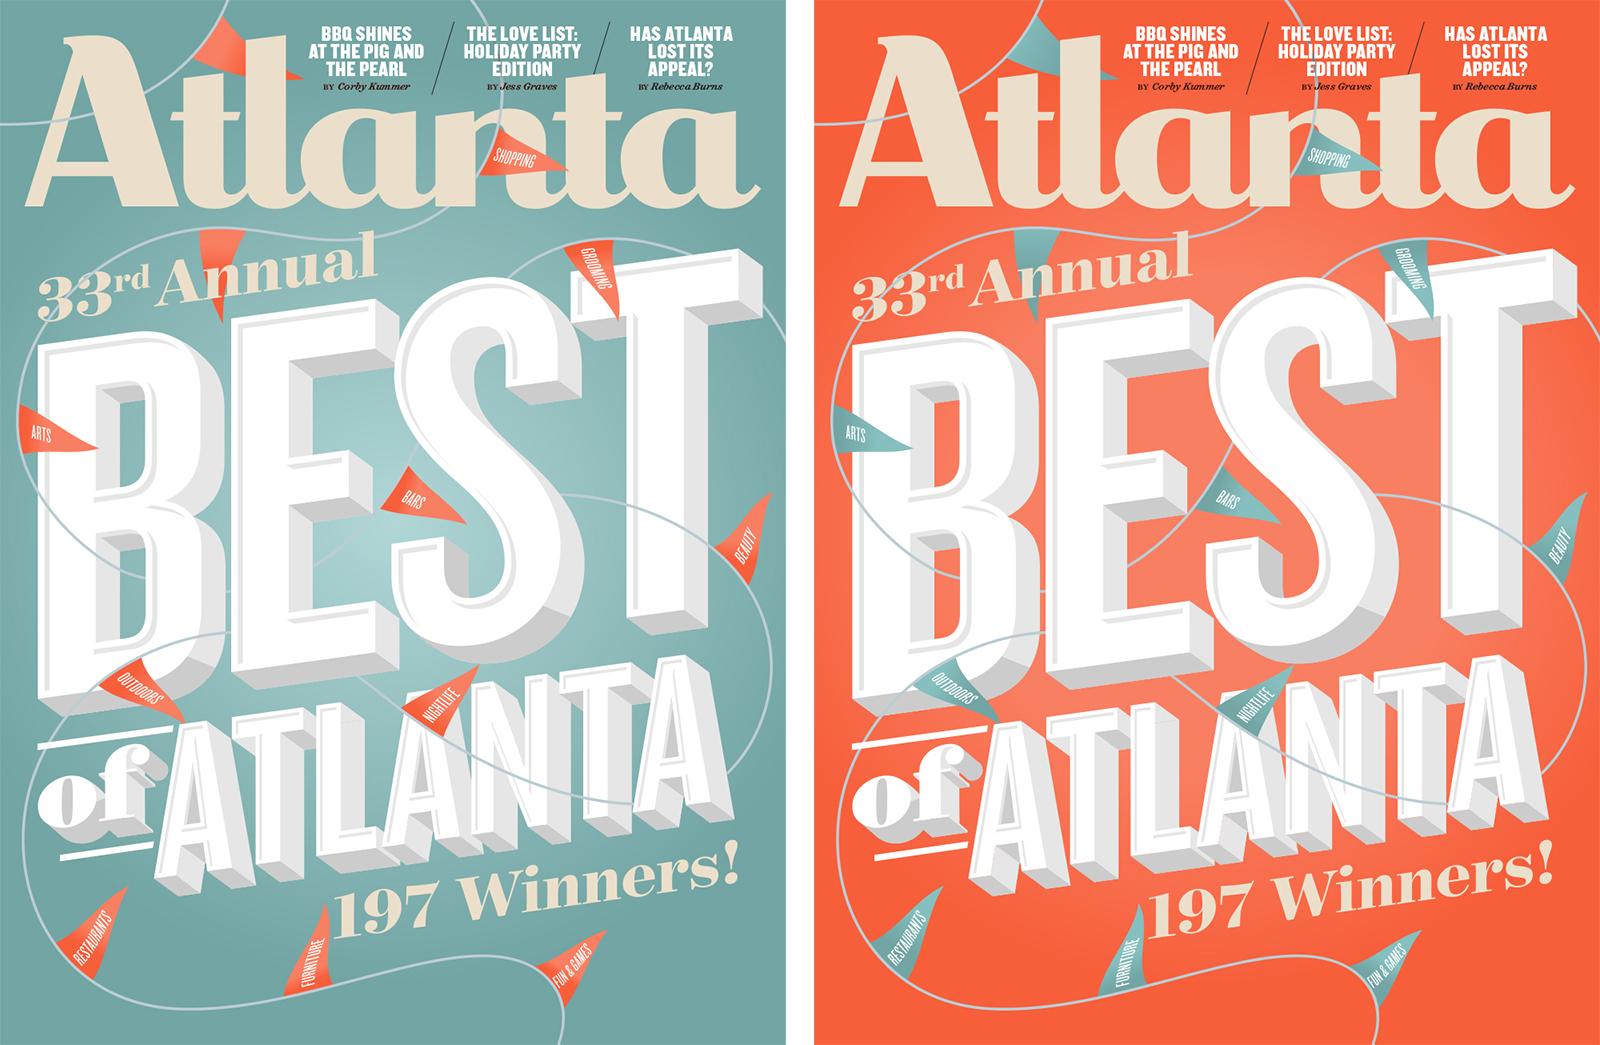 bryan-patrick-todd-atlanta-magazine-best-of-cover-4.jpg